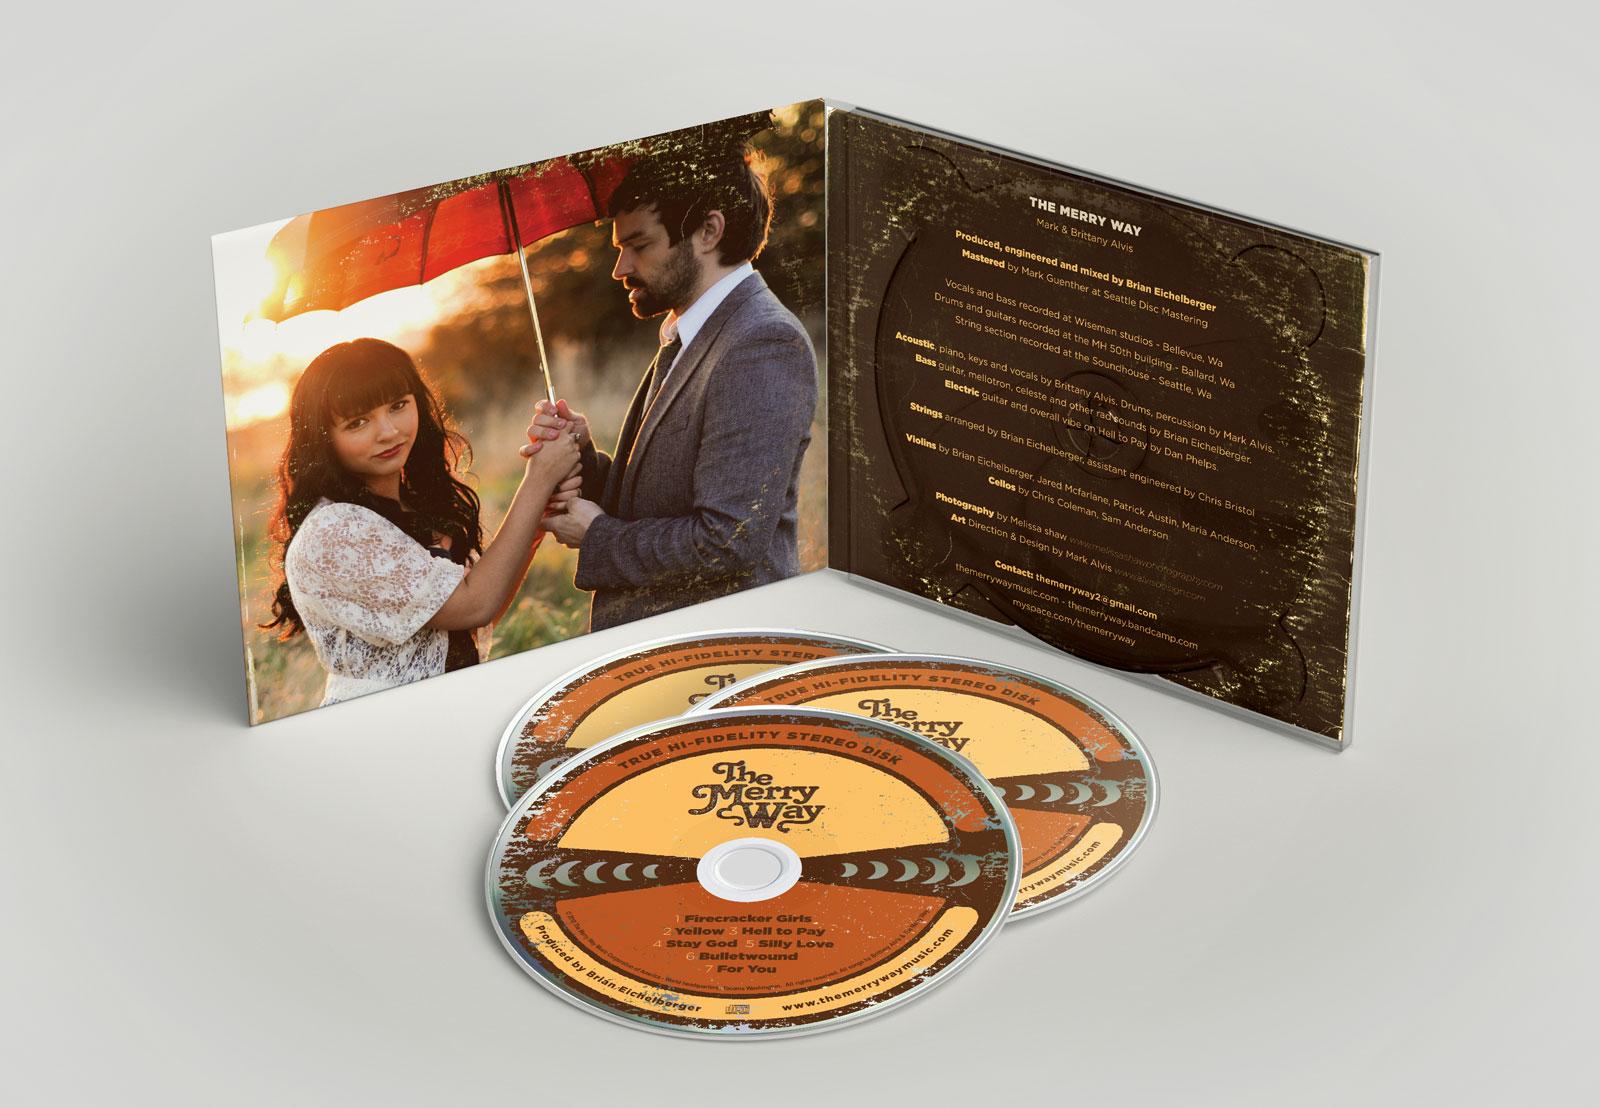 TMW_CD_Album_Packaging_Digipack_3.jpg